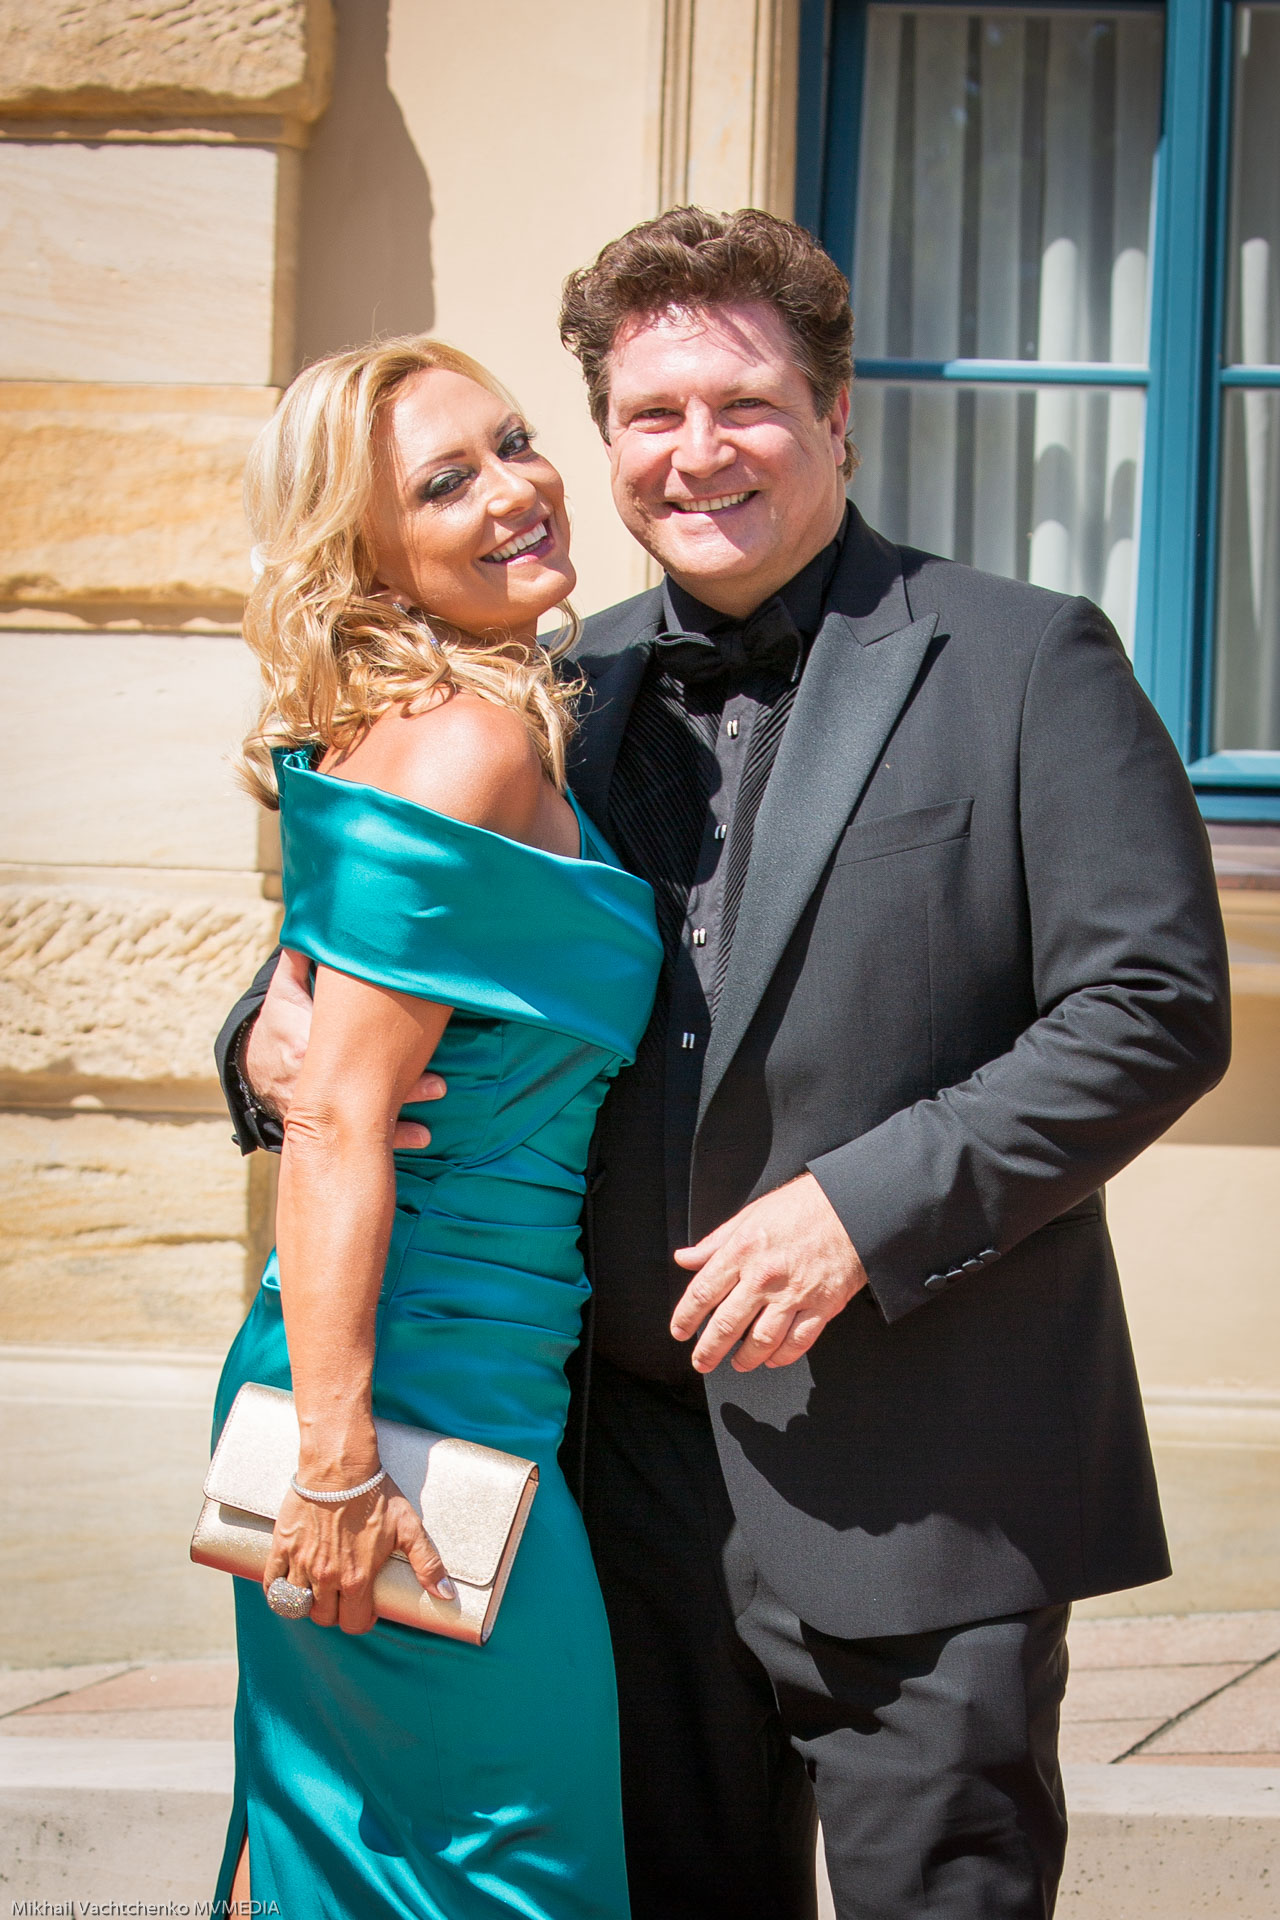 Schauspieler Francis Fulton-Smith mit Lebensgefährtin Claudia Hillmeier